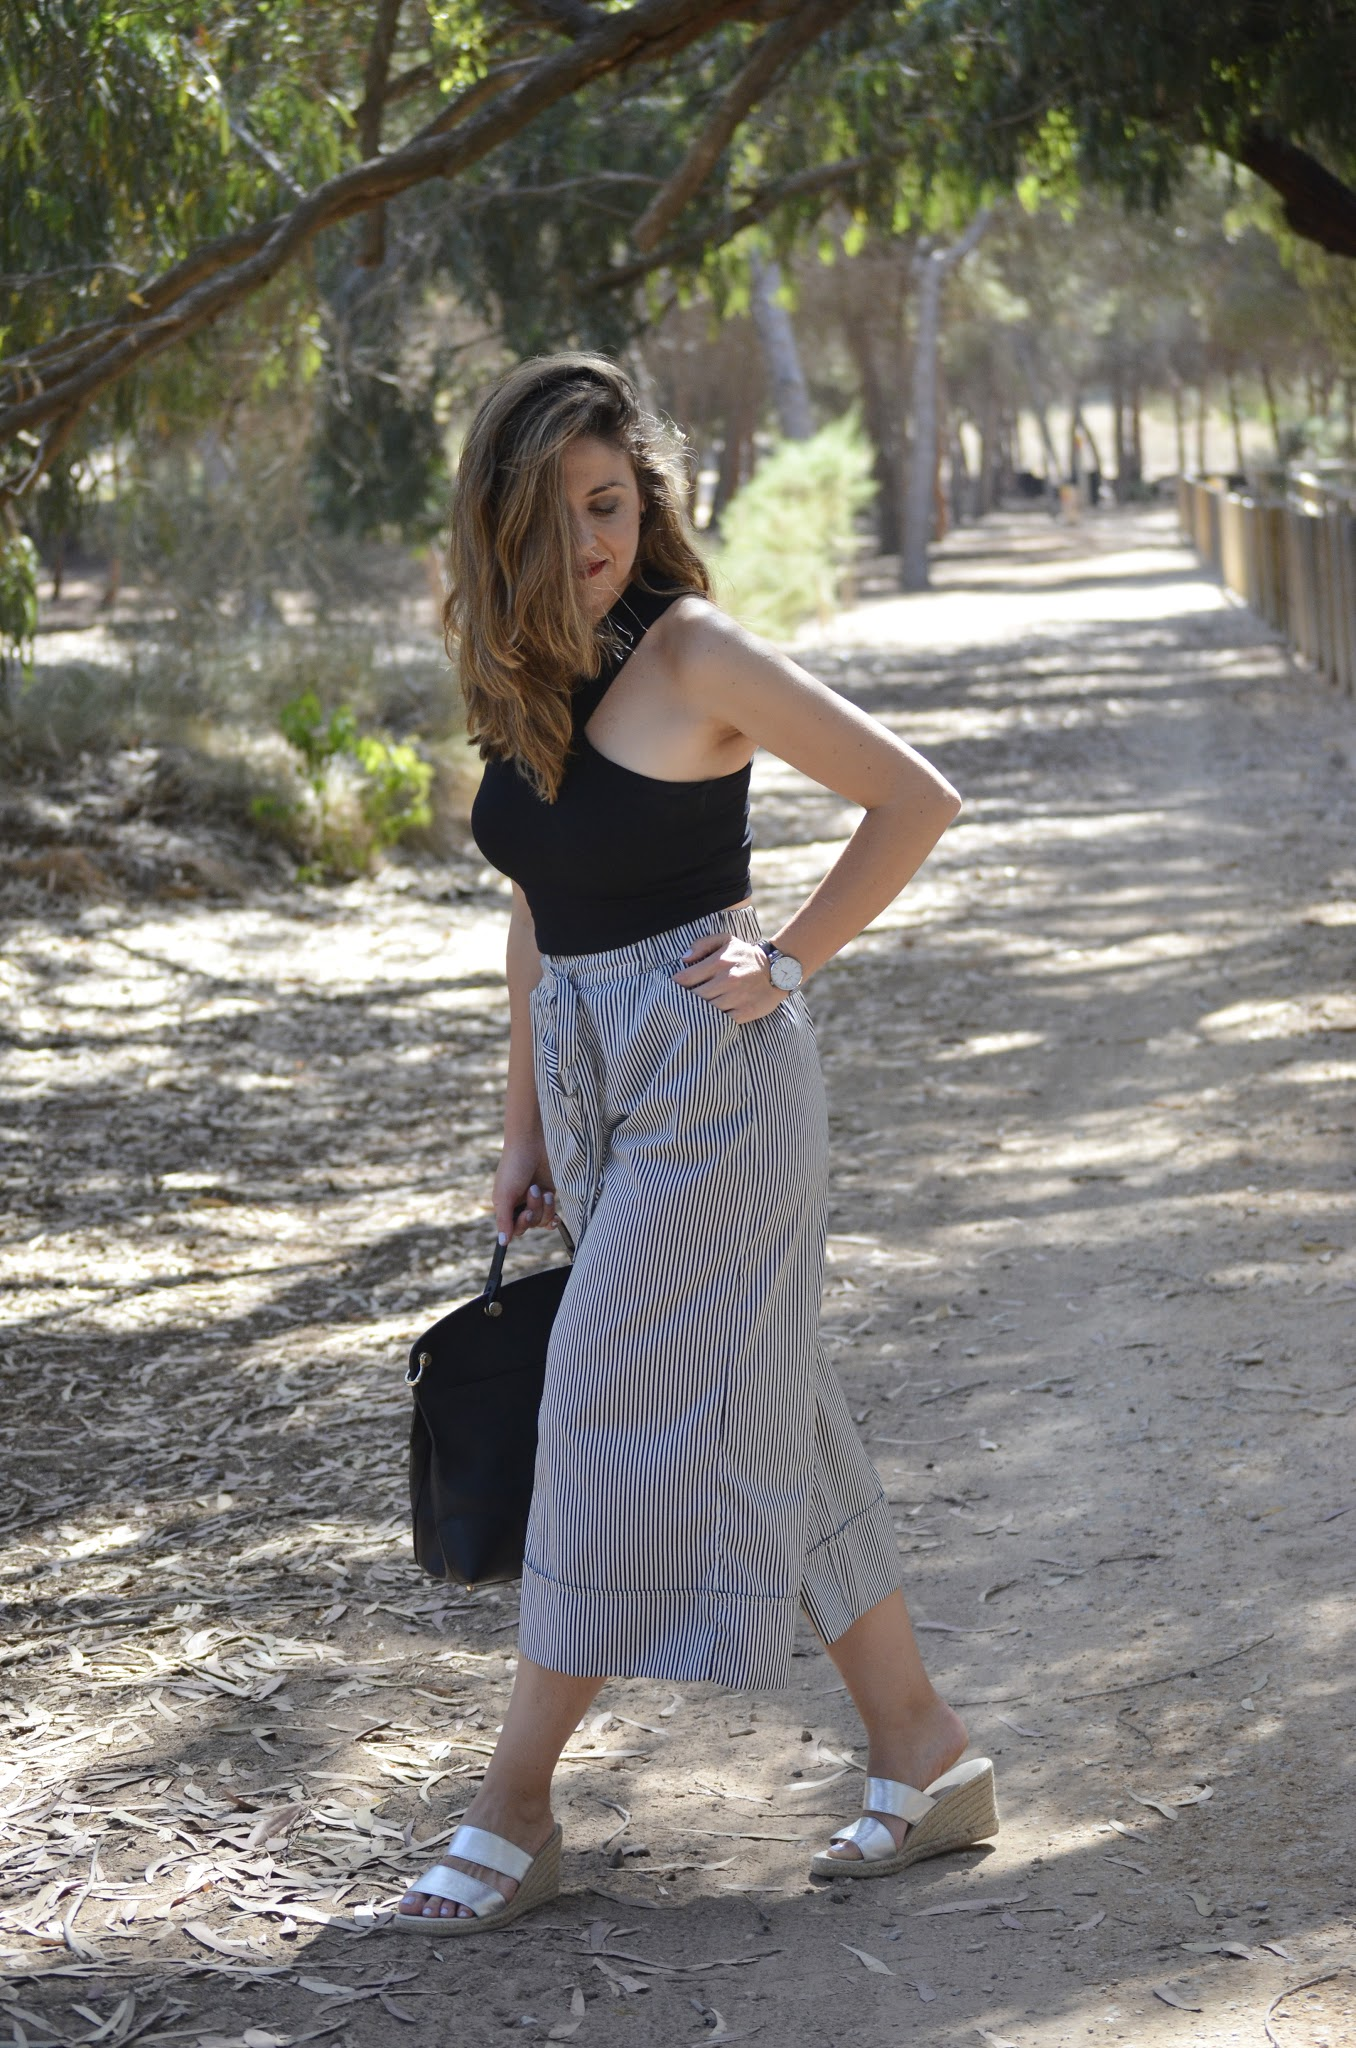 culotte_pants_zara_fashionblogger_tarasessence